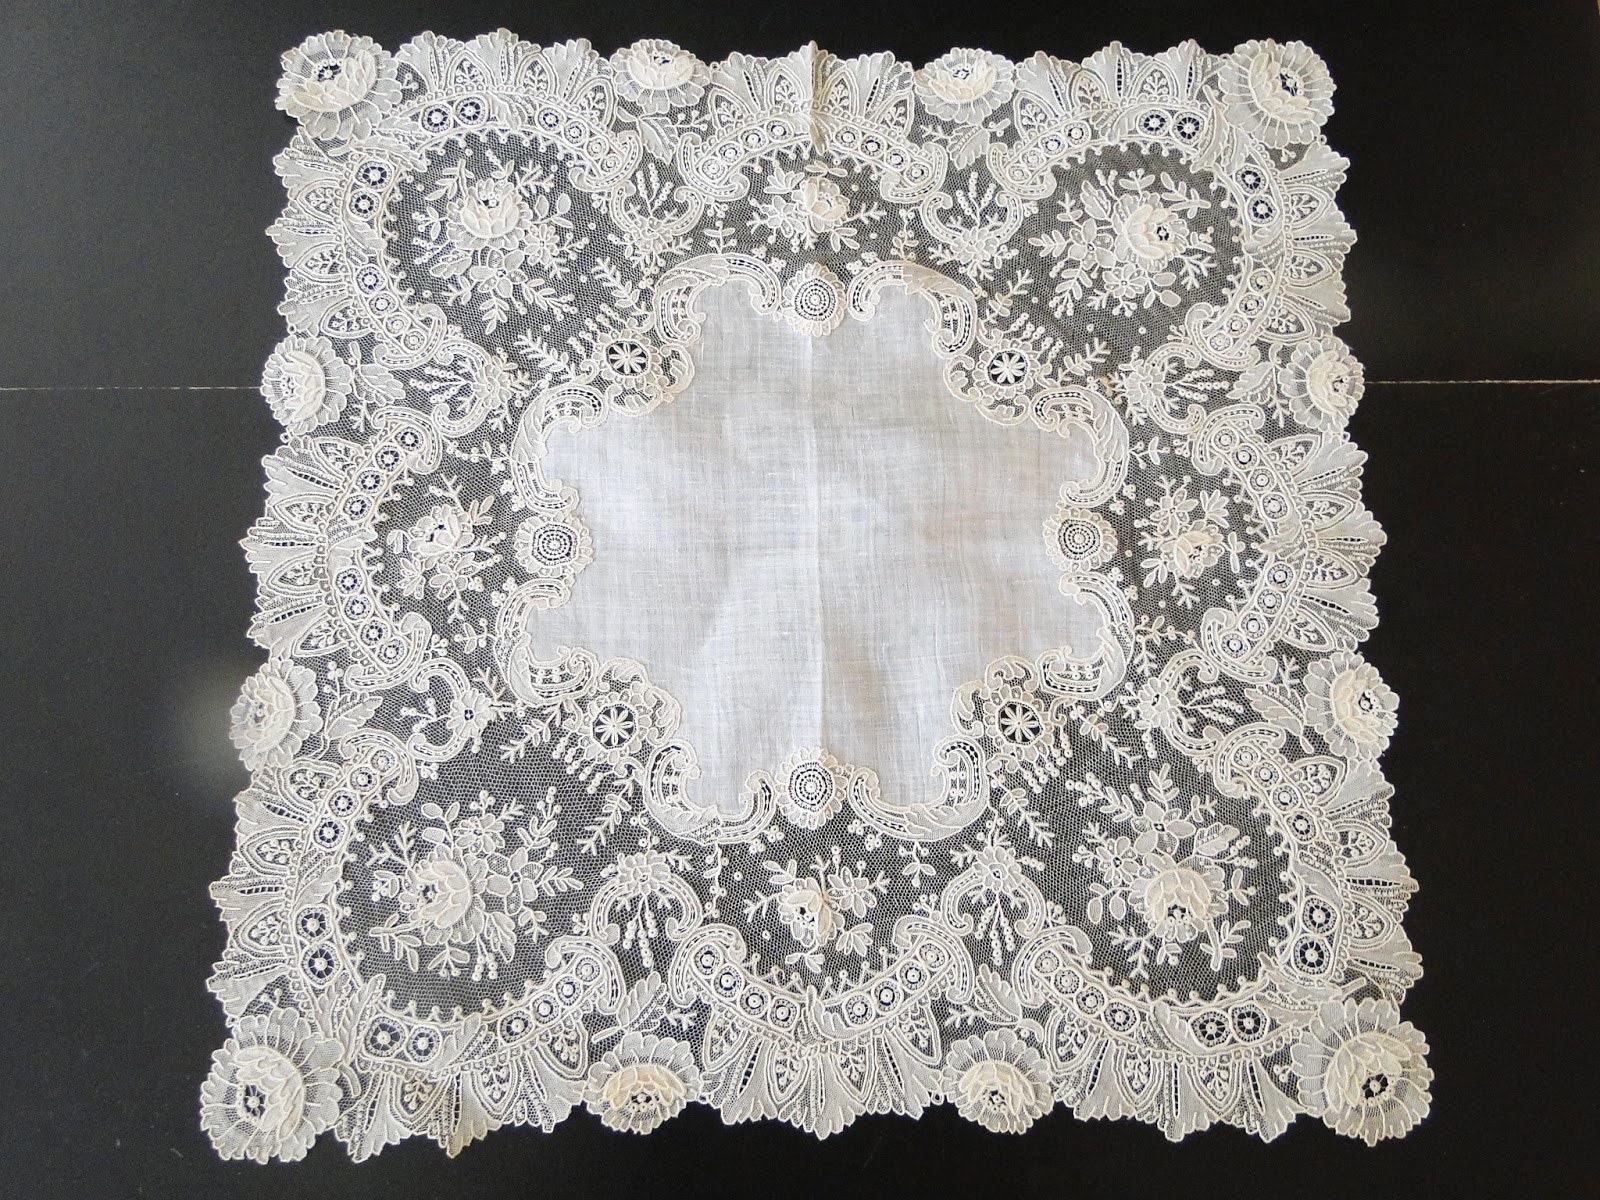 Vintage Wedding Dresses Reno: Buyer & Seller Of Antique Lace, Fine Linens, Vintage